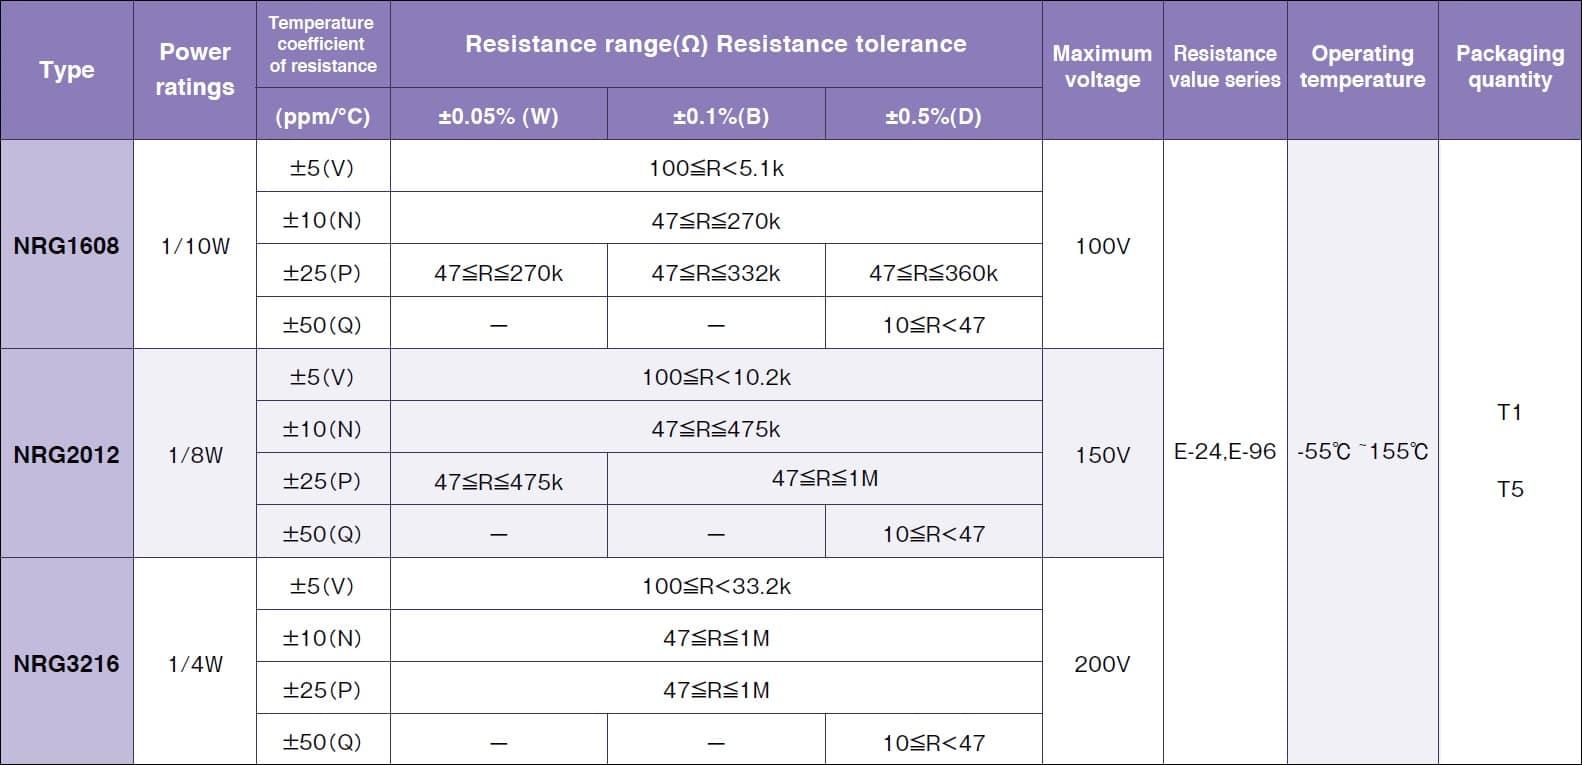 Susumu NRG3216 Specifications